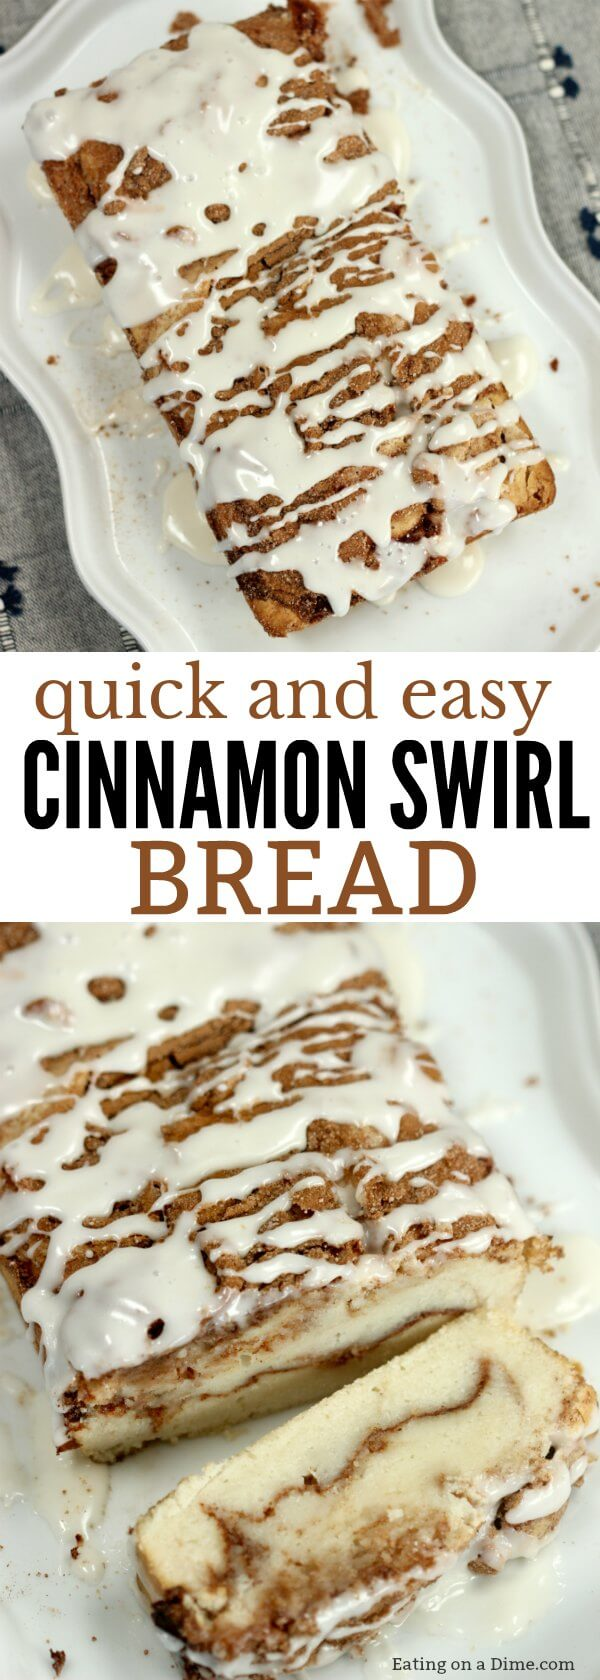 Cinnamon Swirl Bread Recipe Best Cinnamon Swirl Bread